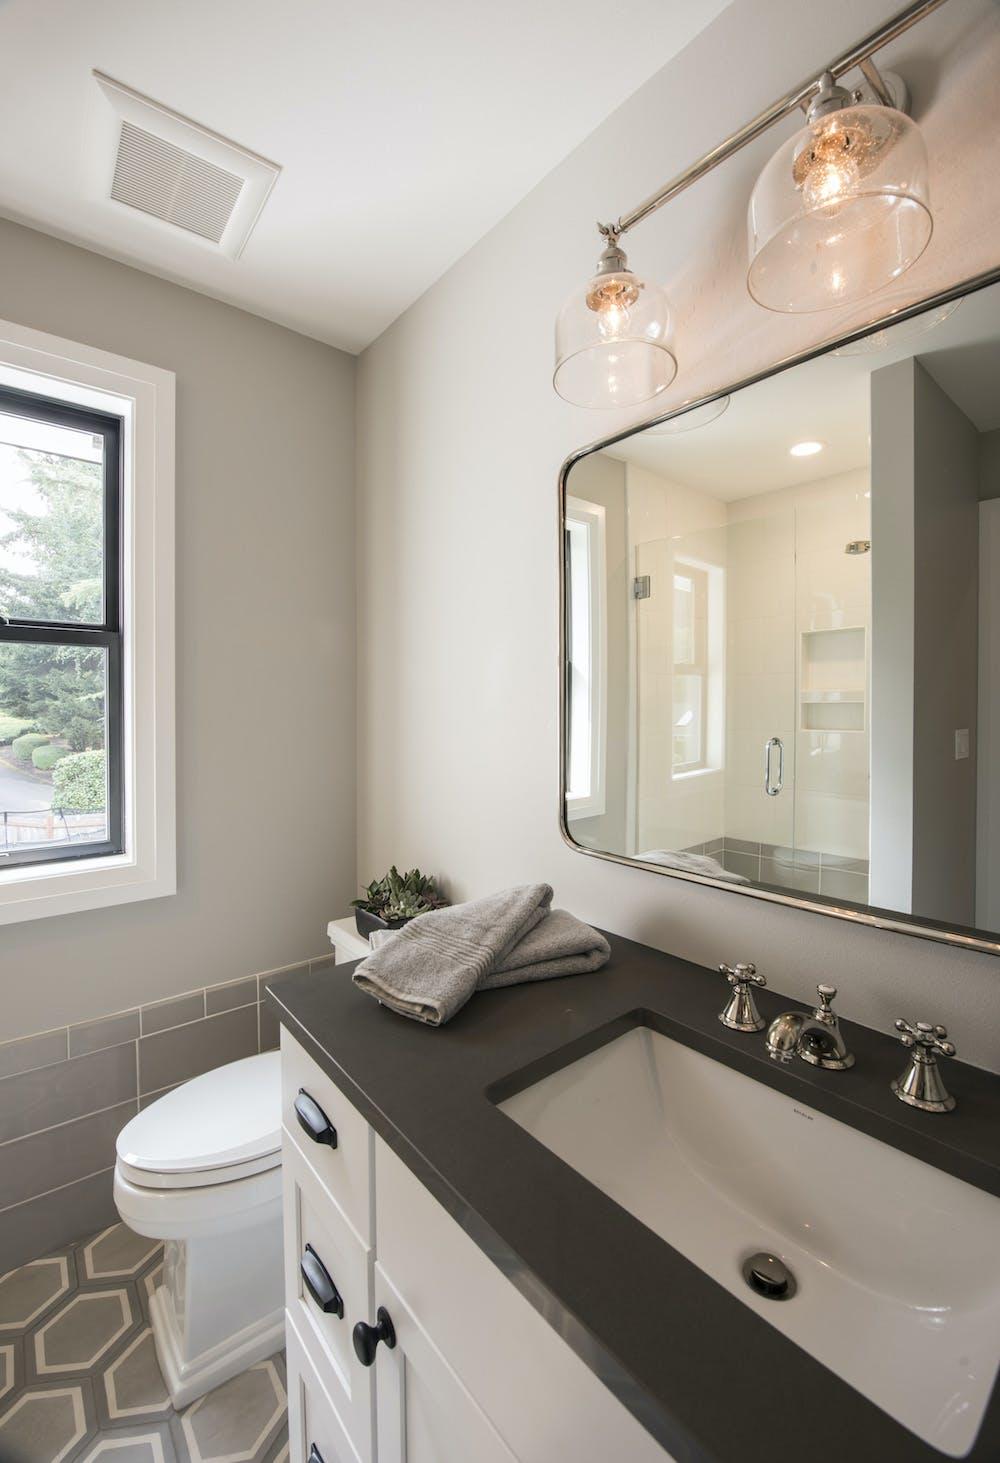 Image of Landons Bathroom Silsetone Cemento Spa 1 in 2018 Northwest Idea House Features Dekton & Silestone Surfaces - Cosentino